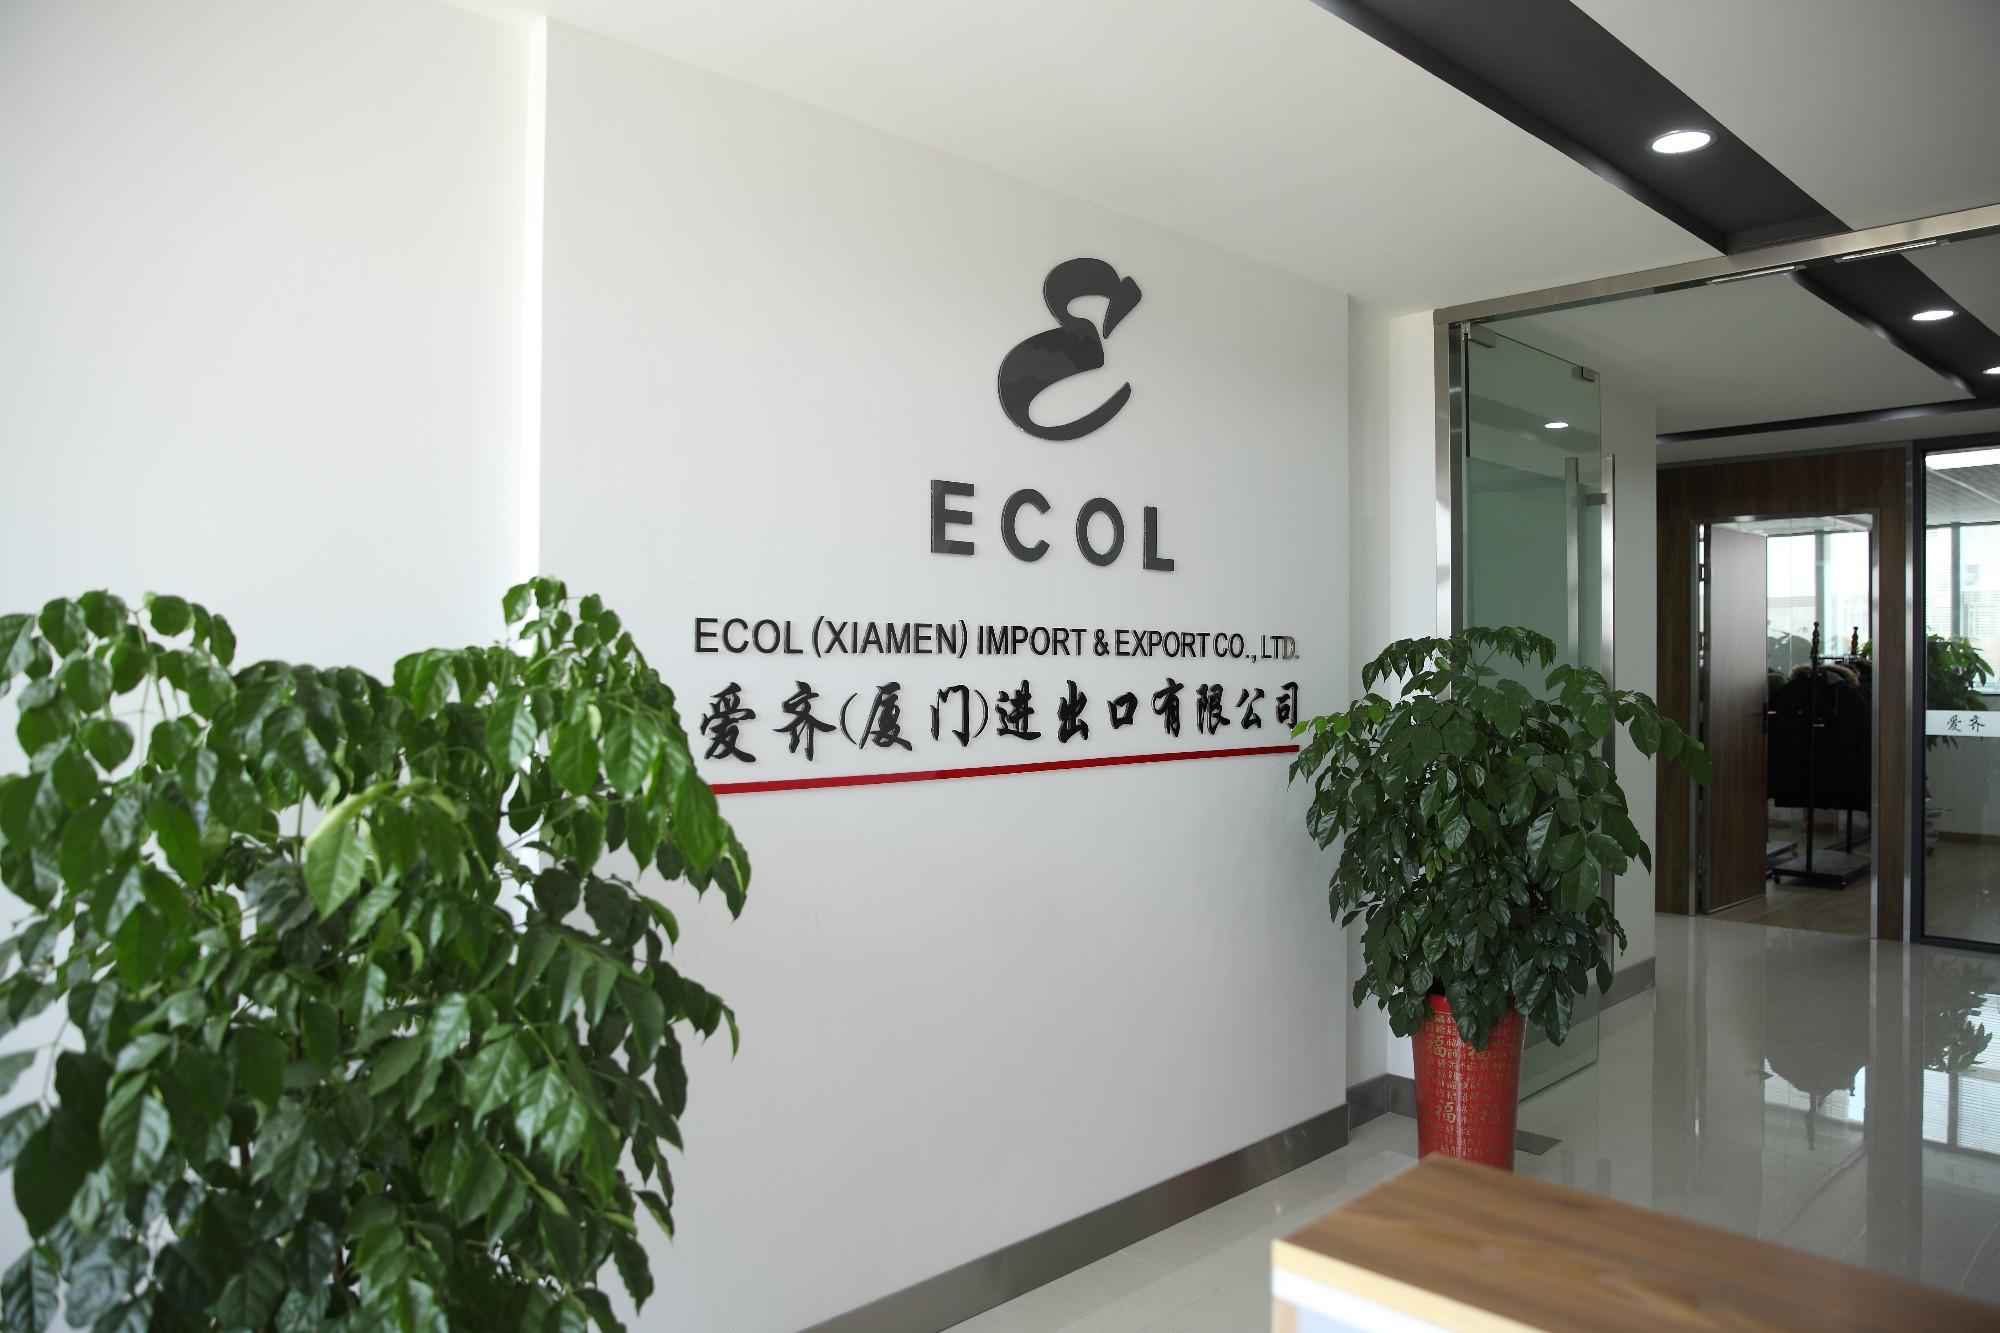 ECOL (XIAMEN) 수출입 CO. LTD